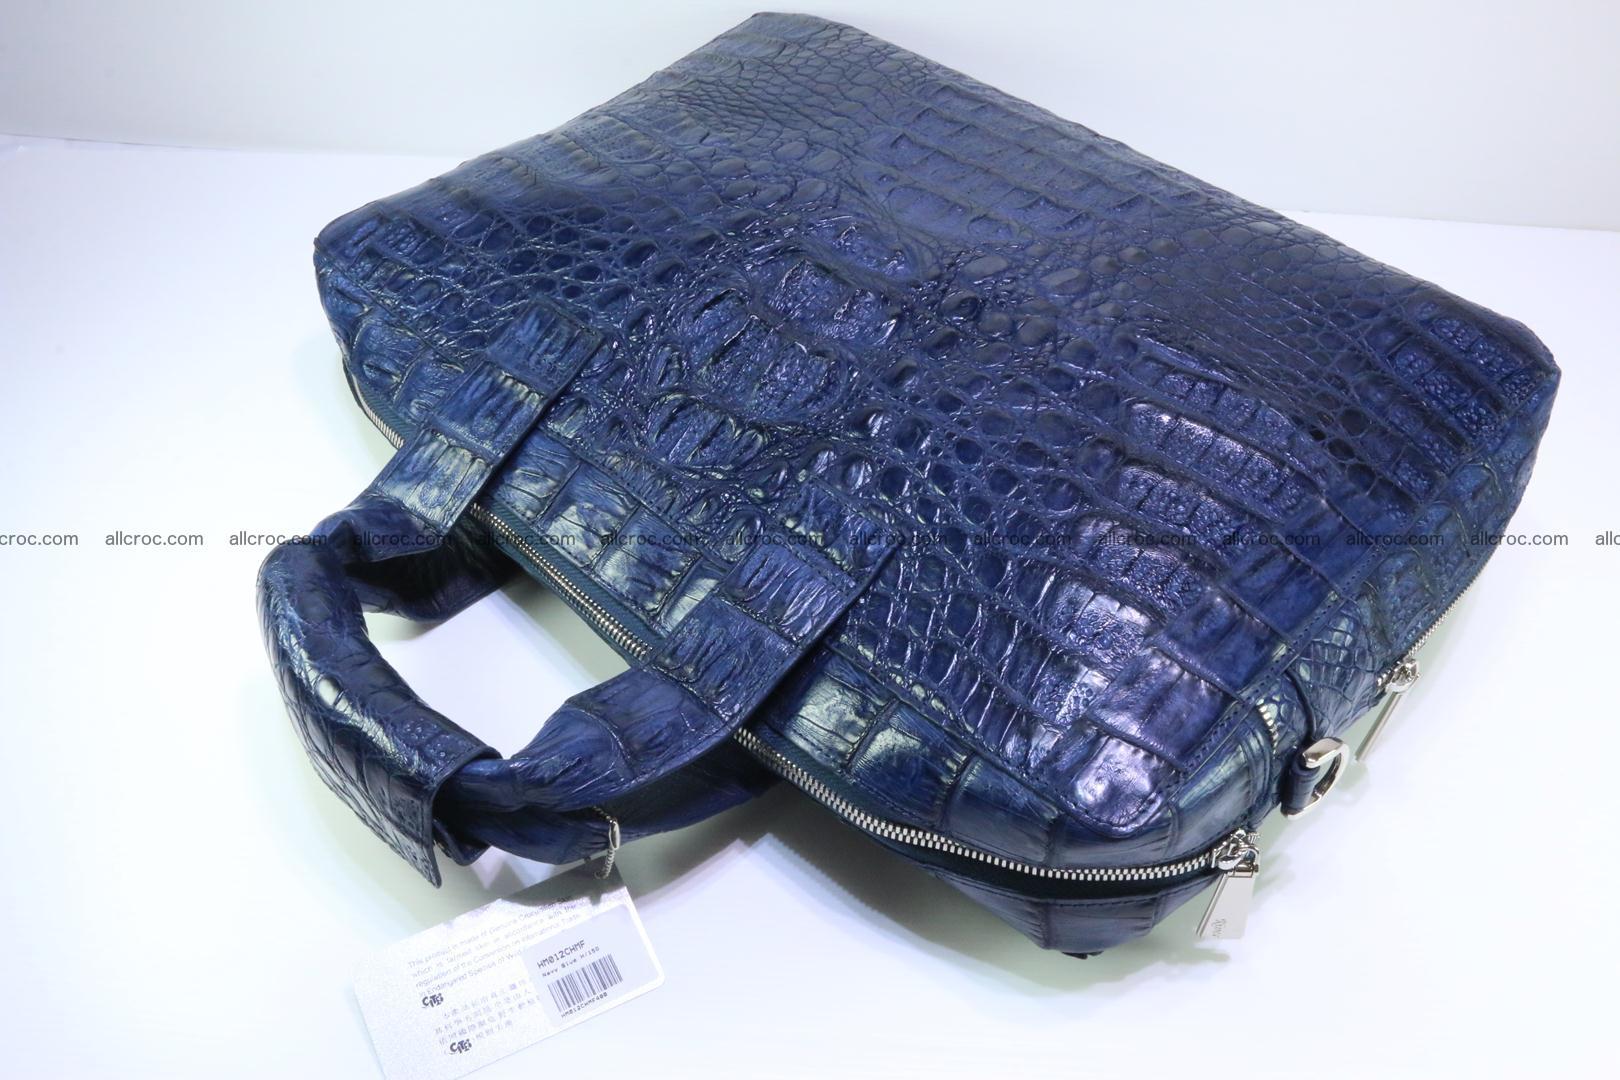 Crocodile skin handbag 423 Foto 7